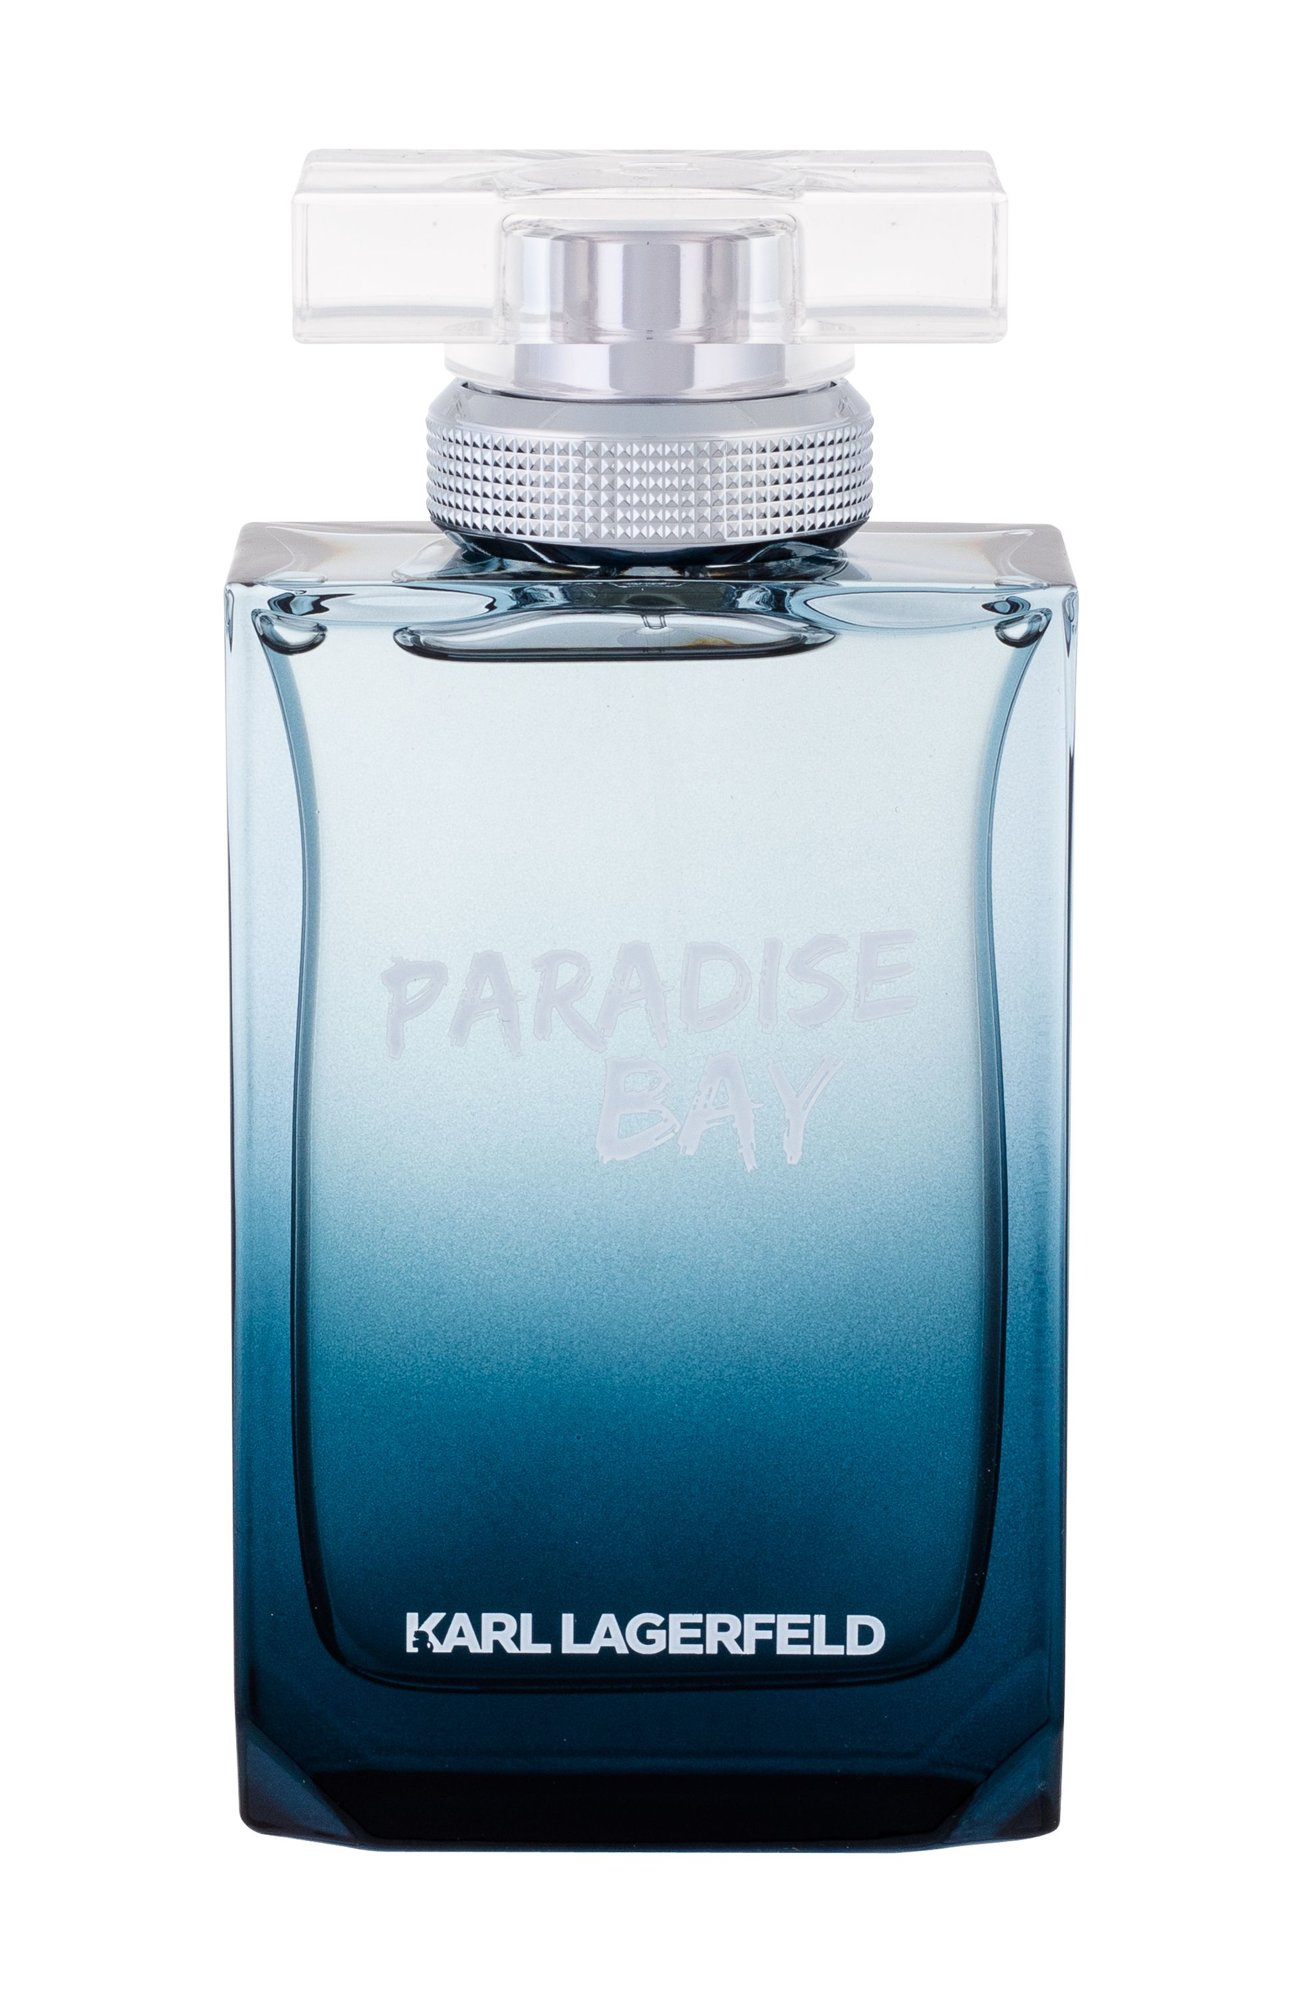 Lagerfeld Karl Lagerfeld Paradise Bay EDT 100ml